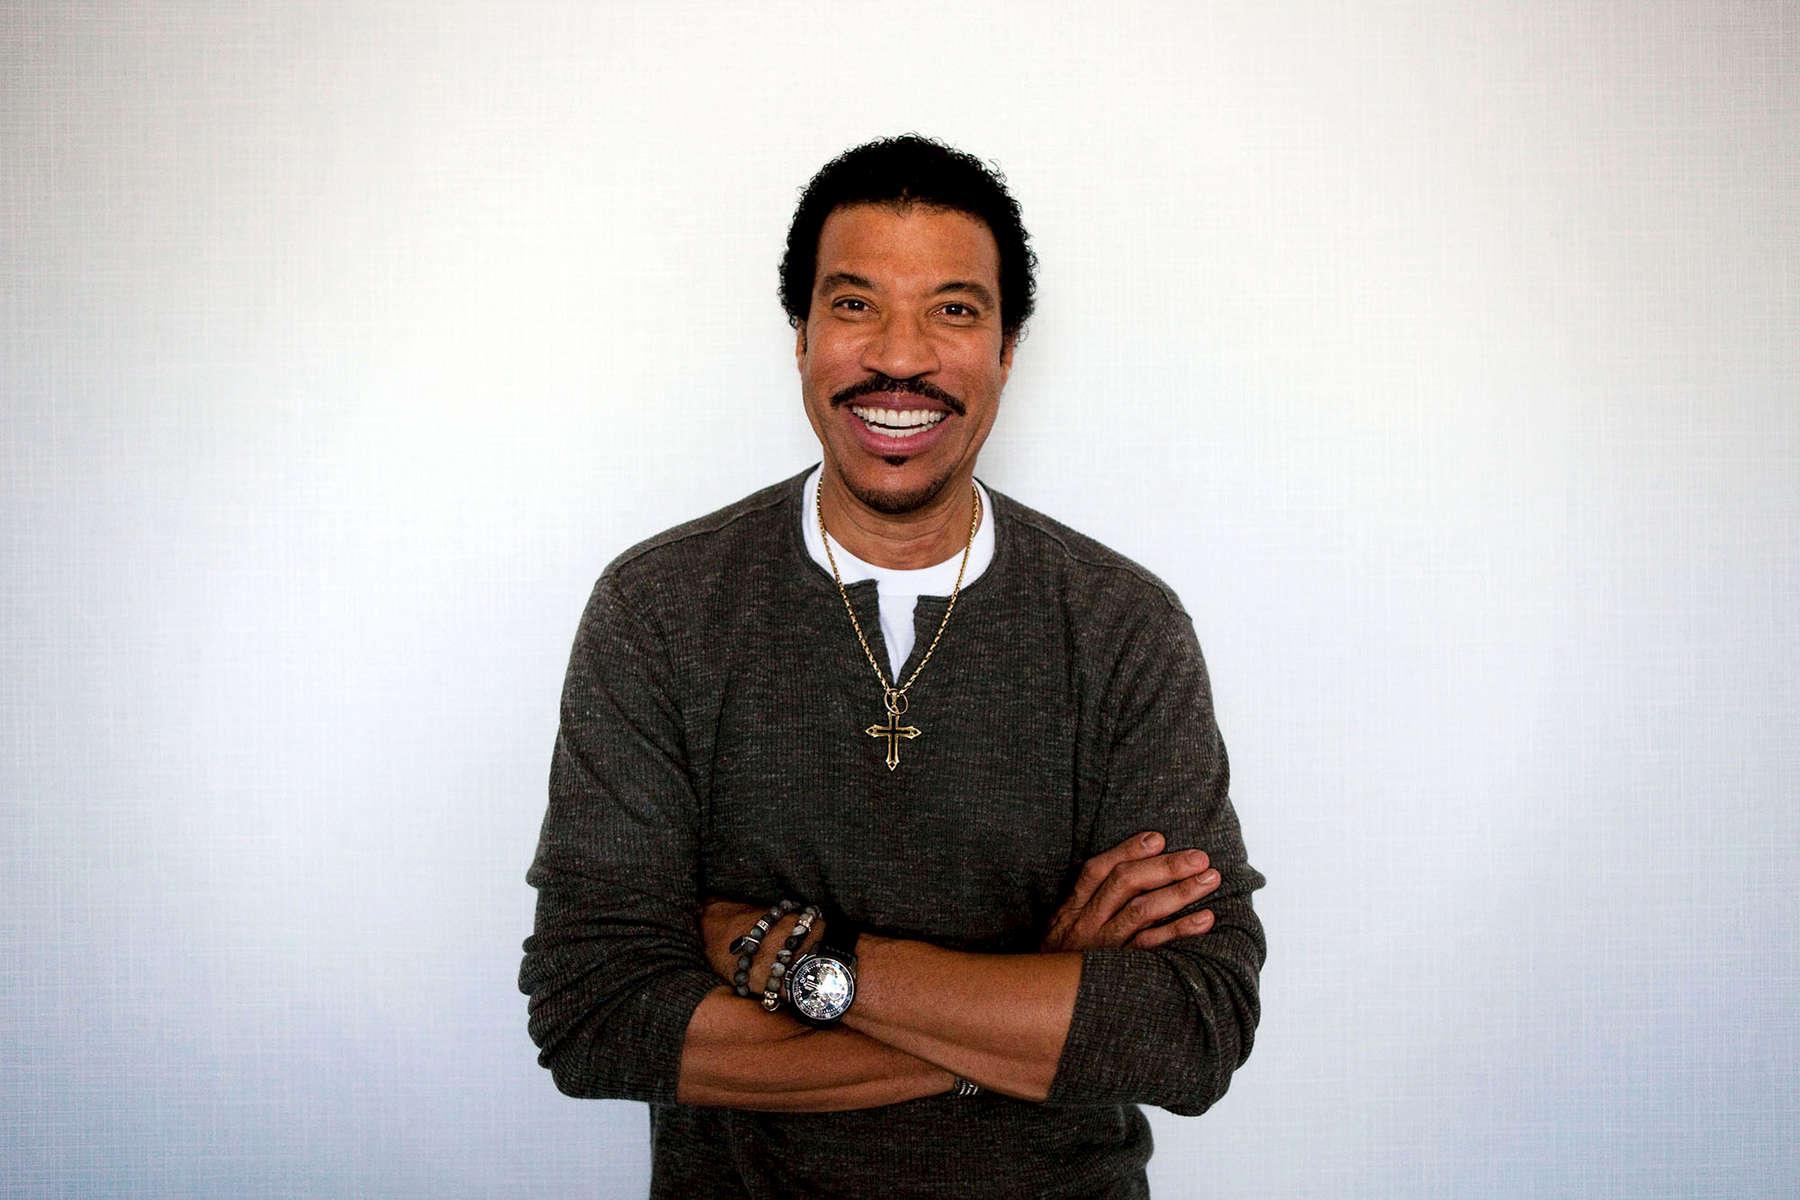 Lionel Richie. musician